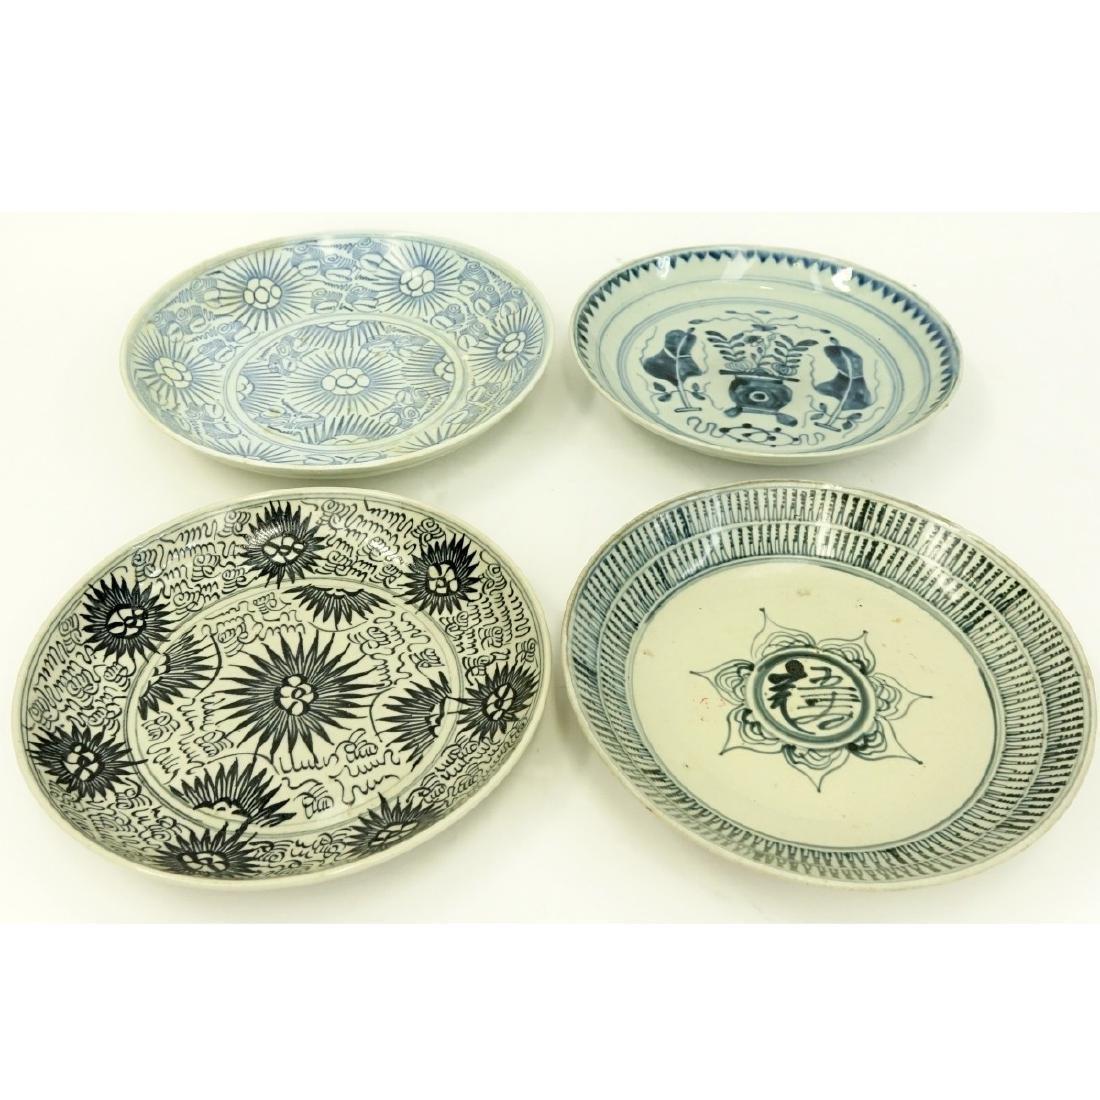 4 Antique Chinese Blue & White Ceramic Bowls - 4